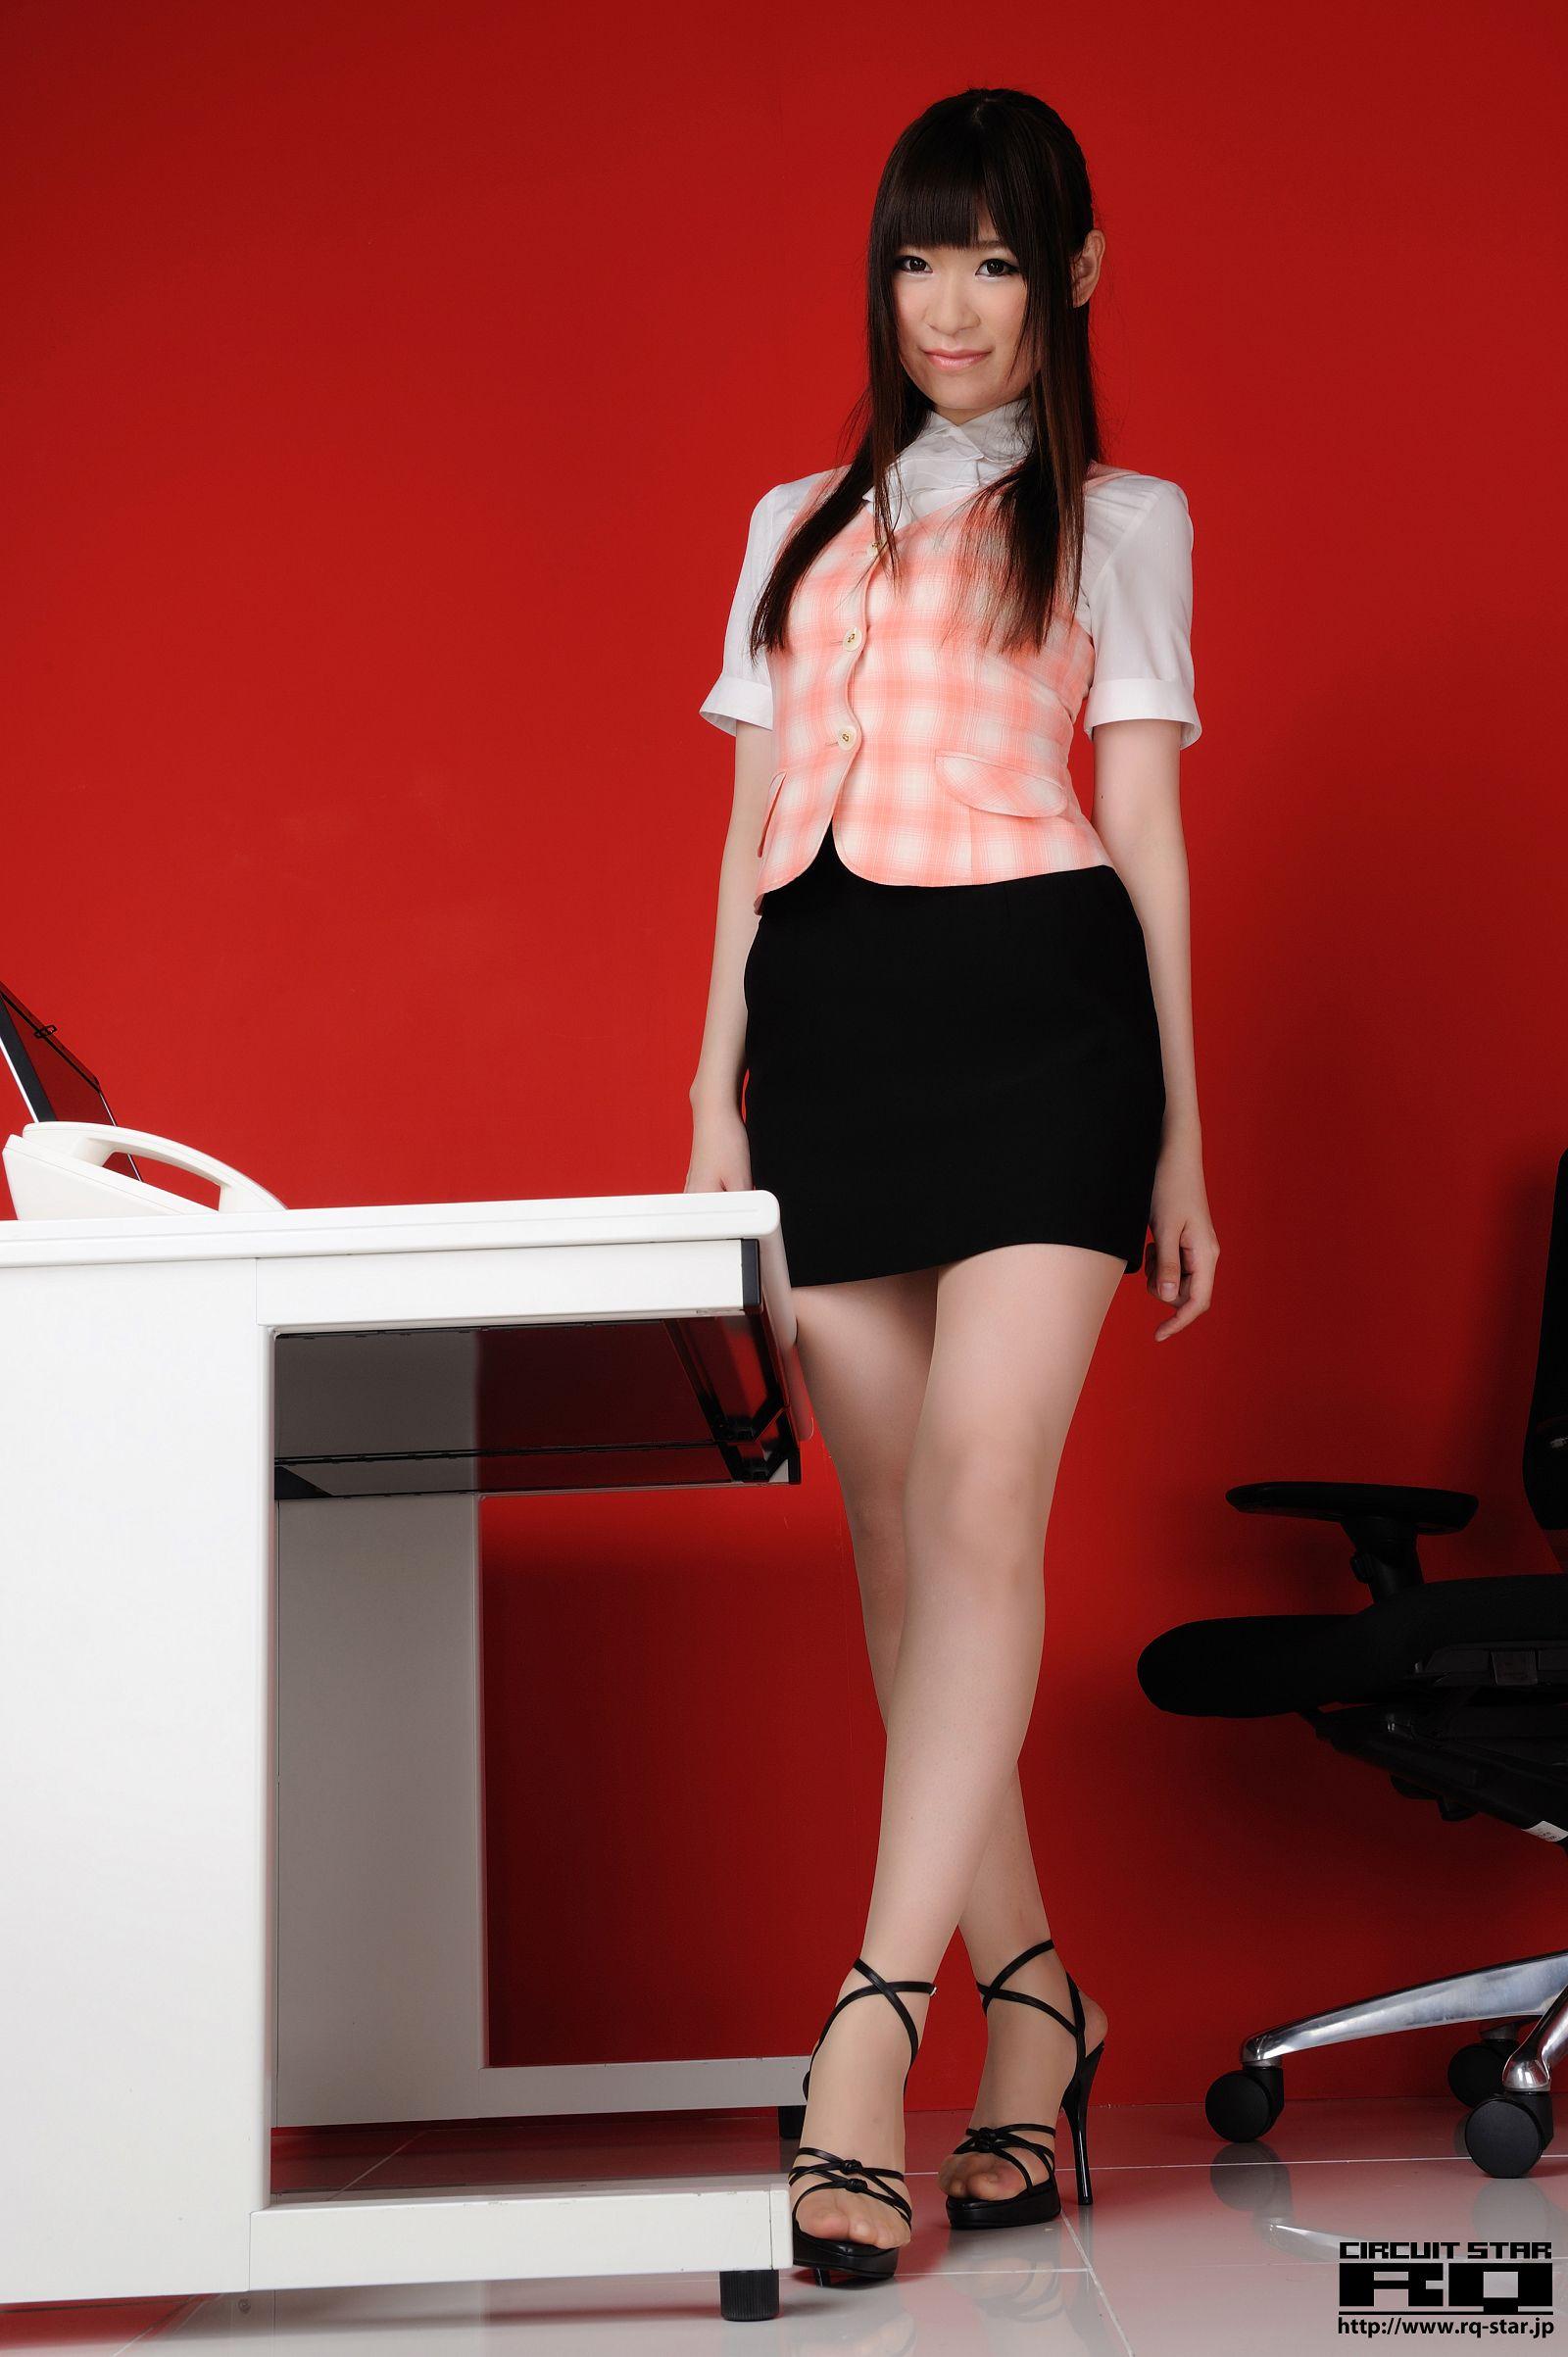 [RQ STAR美女] NO.00566 Eri Tomoki 友木えり Office Lady[77P] RQ STAR 第1张